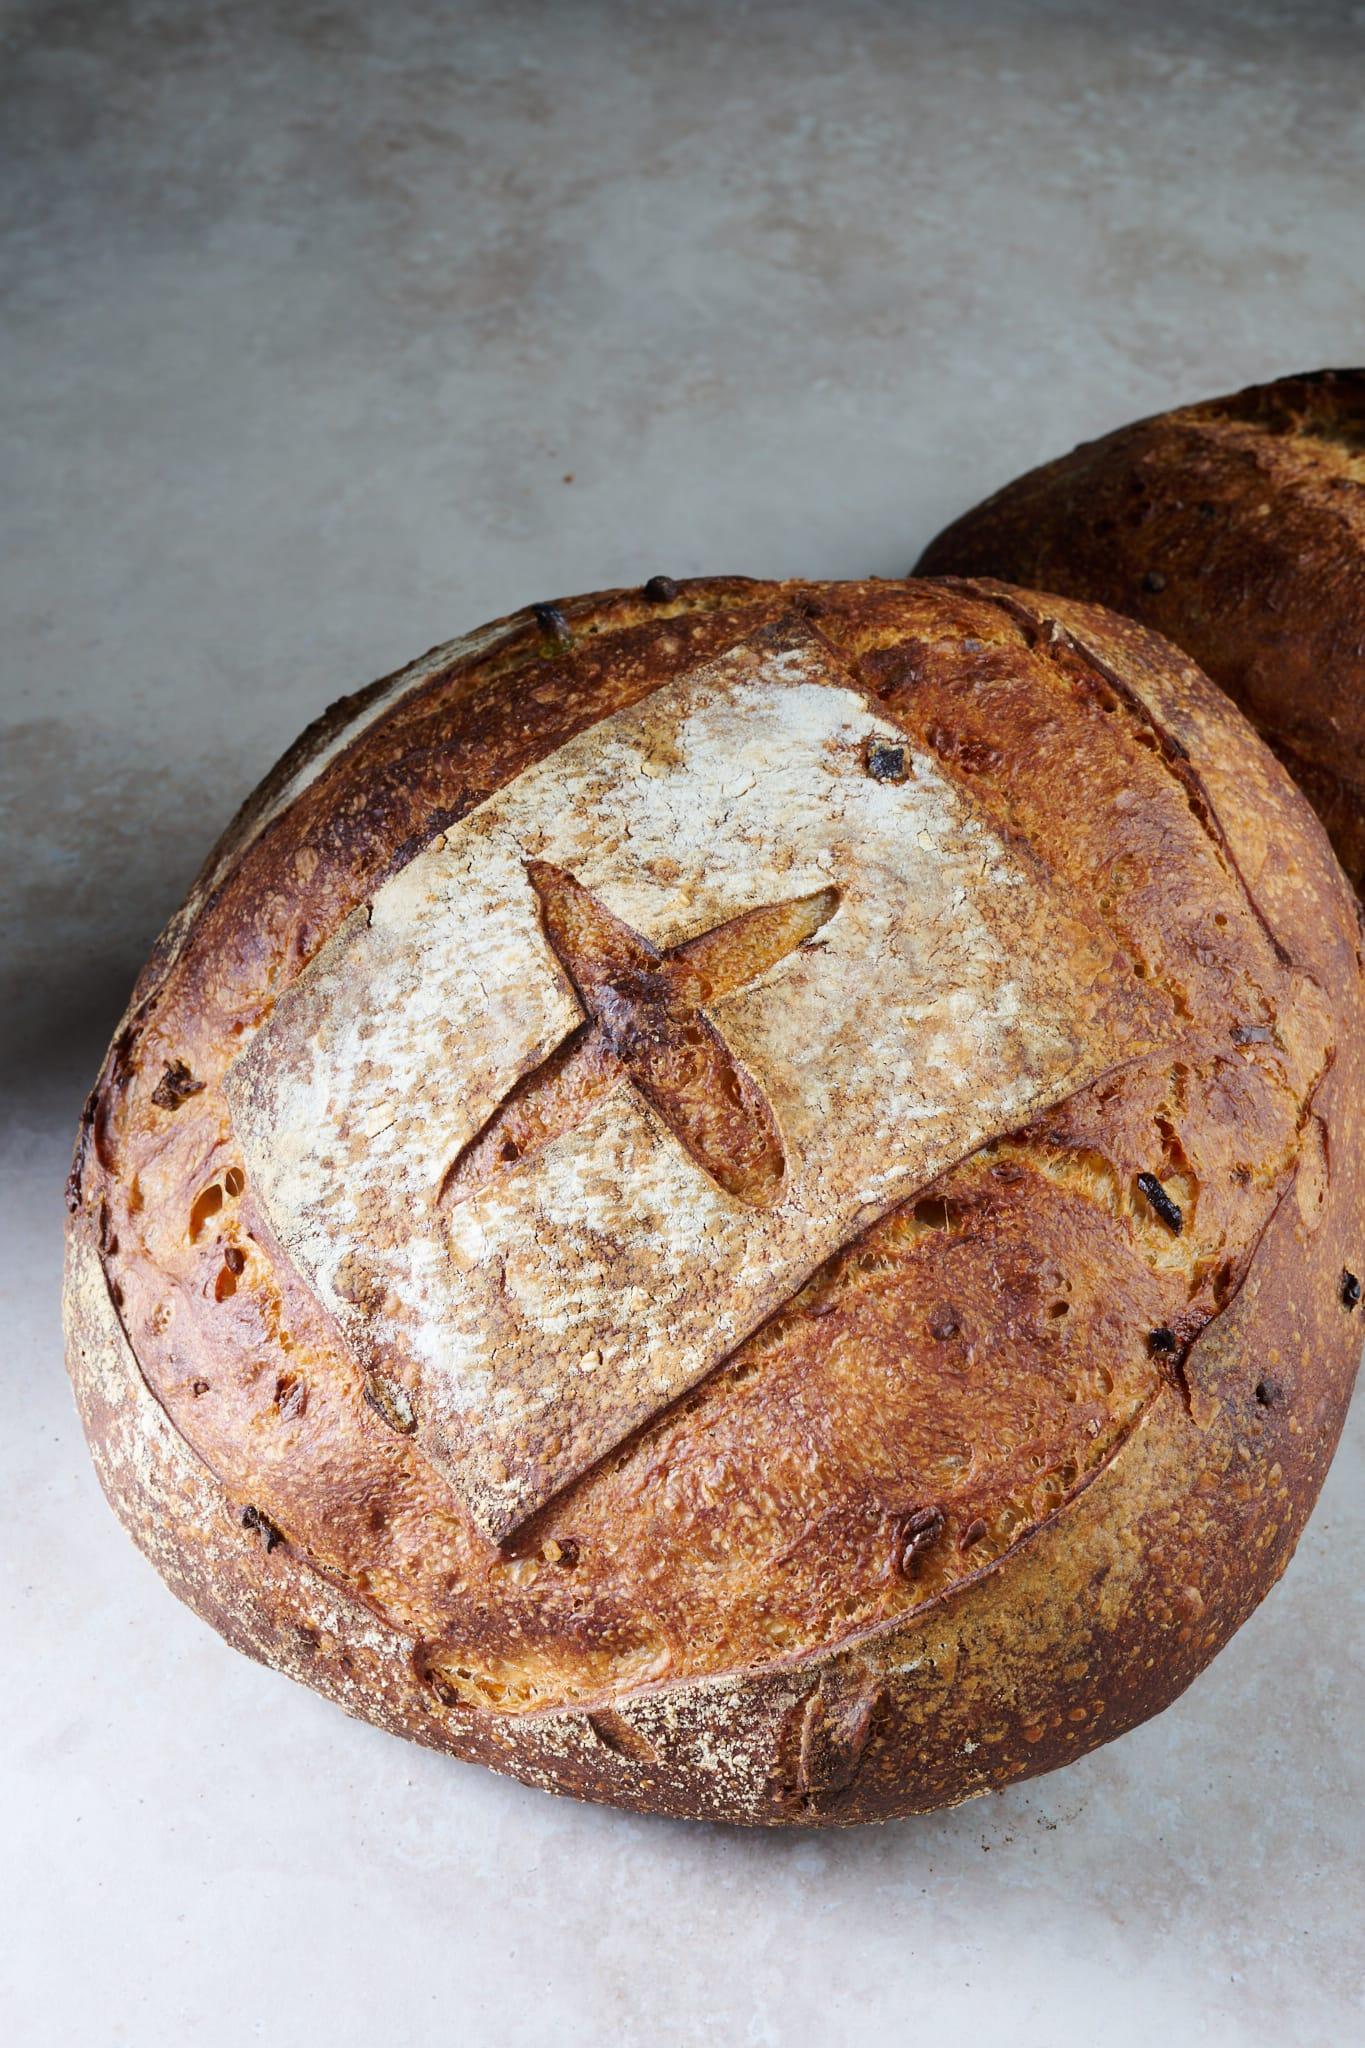 Jalapeño-cheddar sourdough shaped as a boule